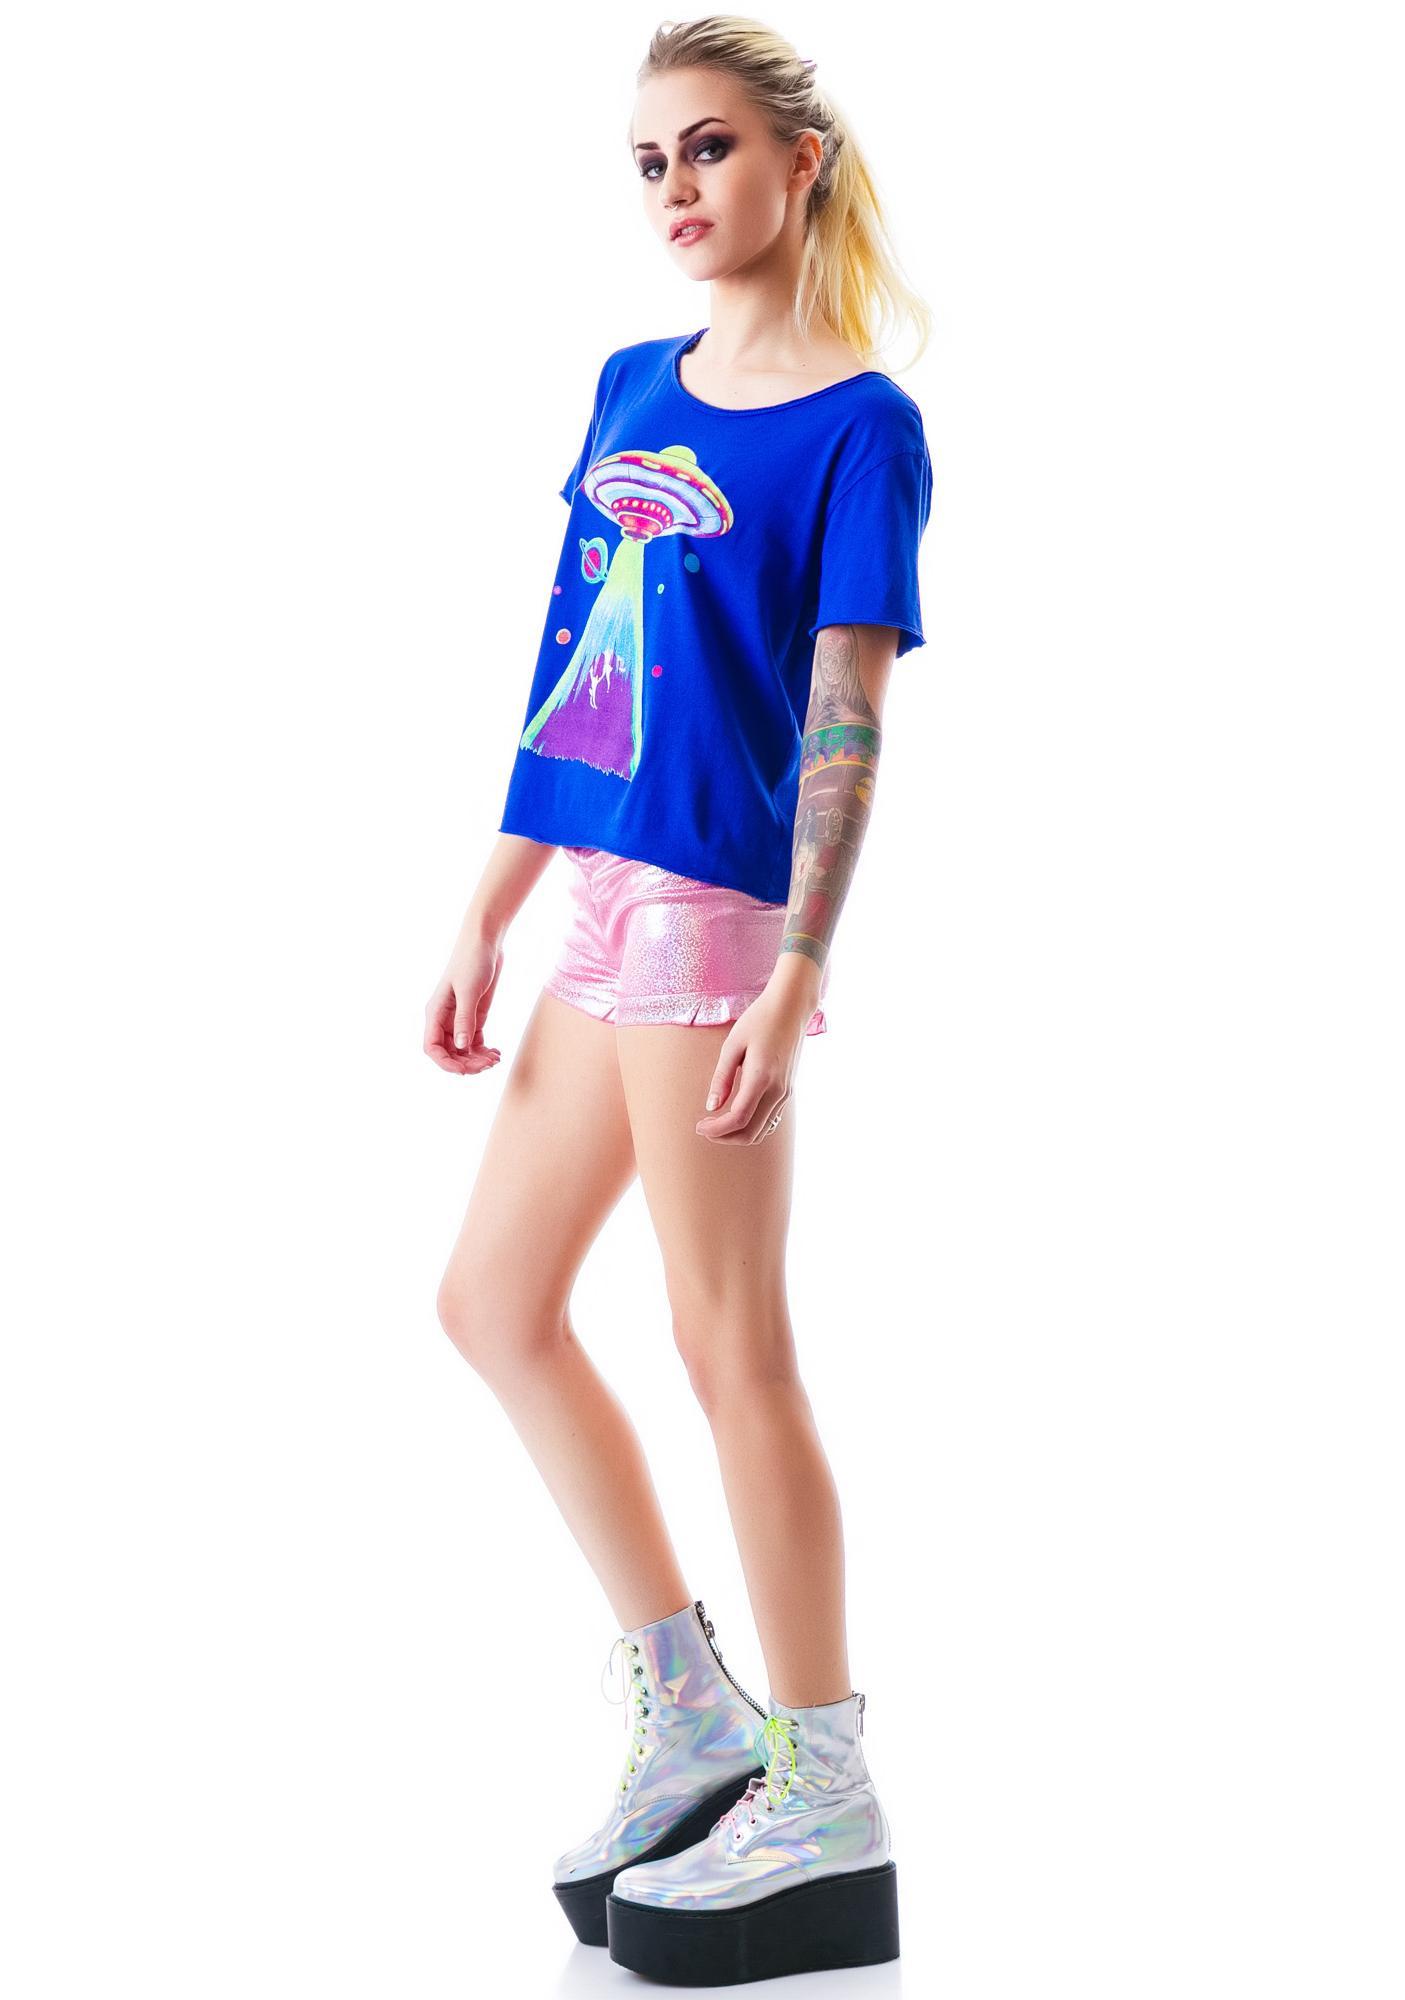 J+CO J+CO Courtney Short Sleeve Top